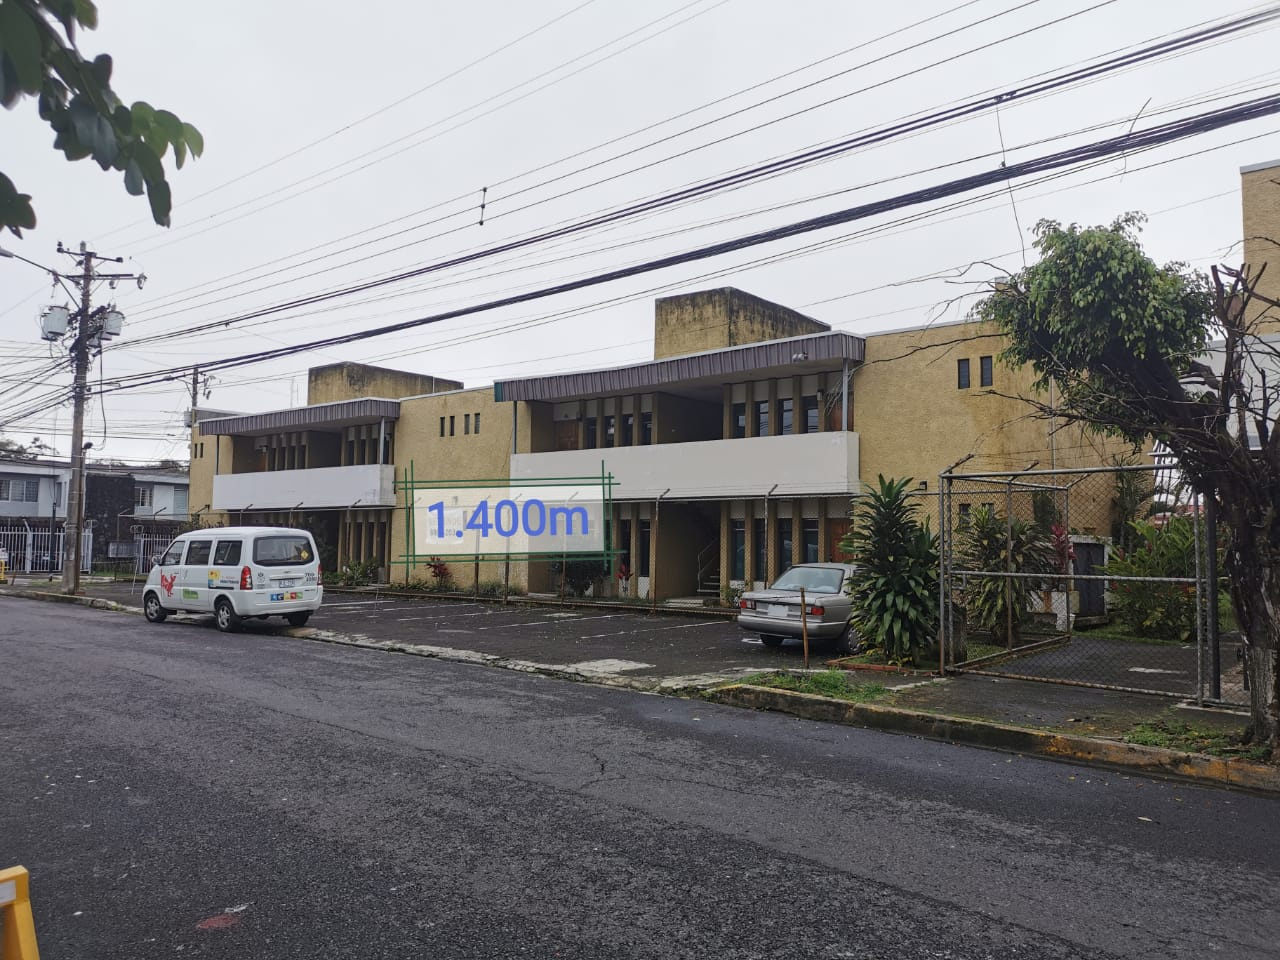 2597 Edificio de Apartamentos en sabana sur